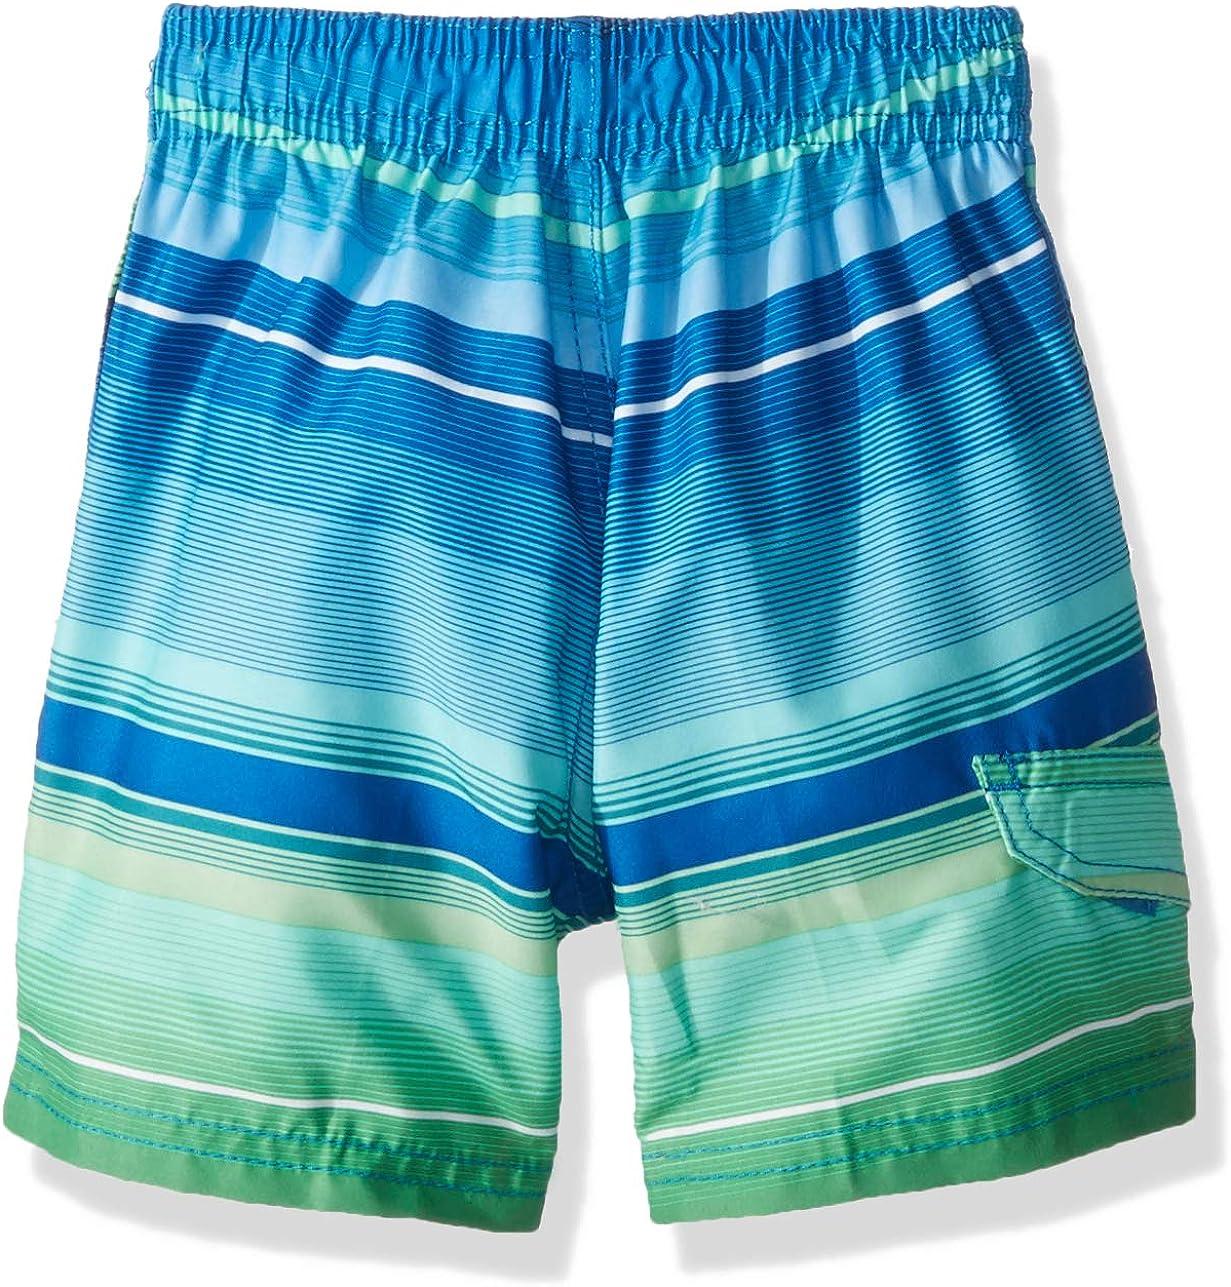 Kanu Surf Boys Reflection Quick Dry UPF 50 Beach Swim Trunk